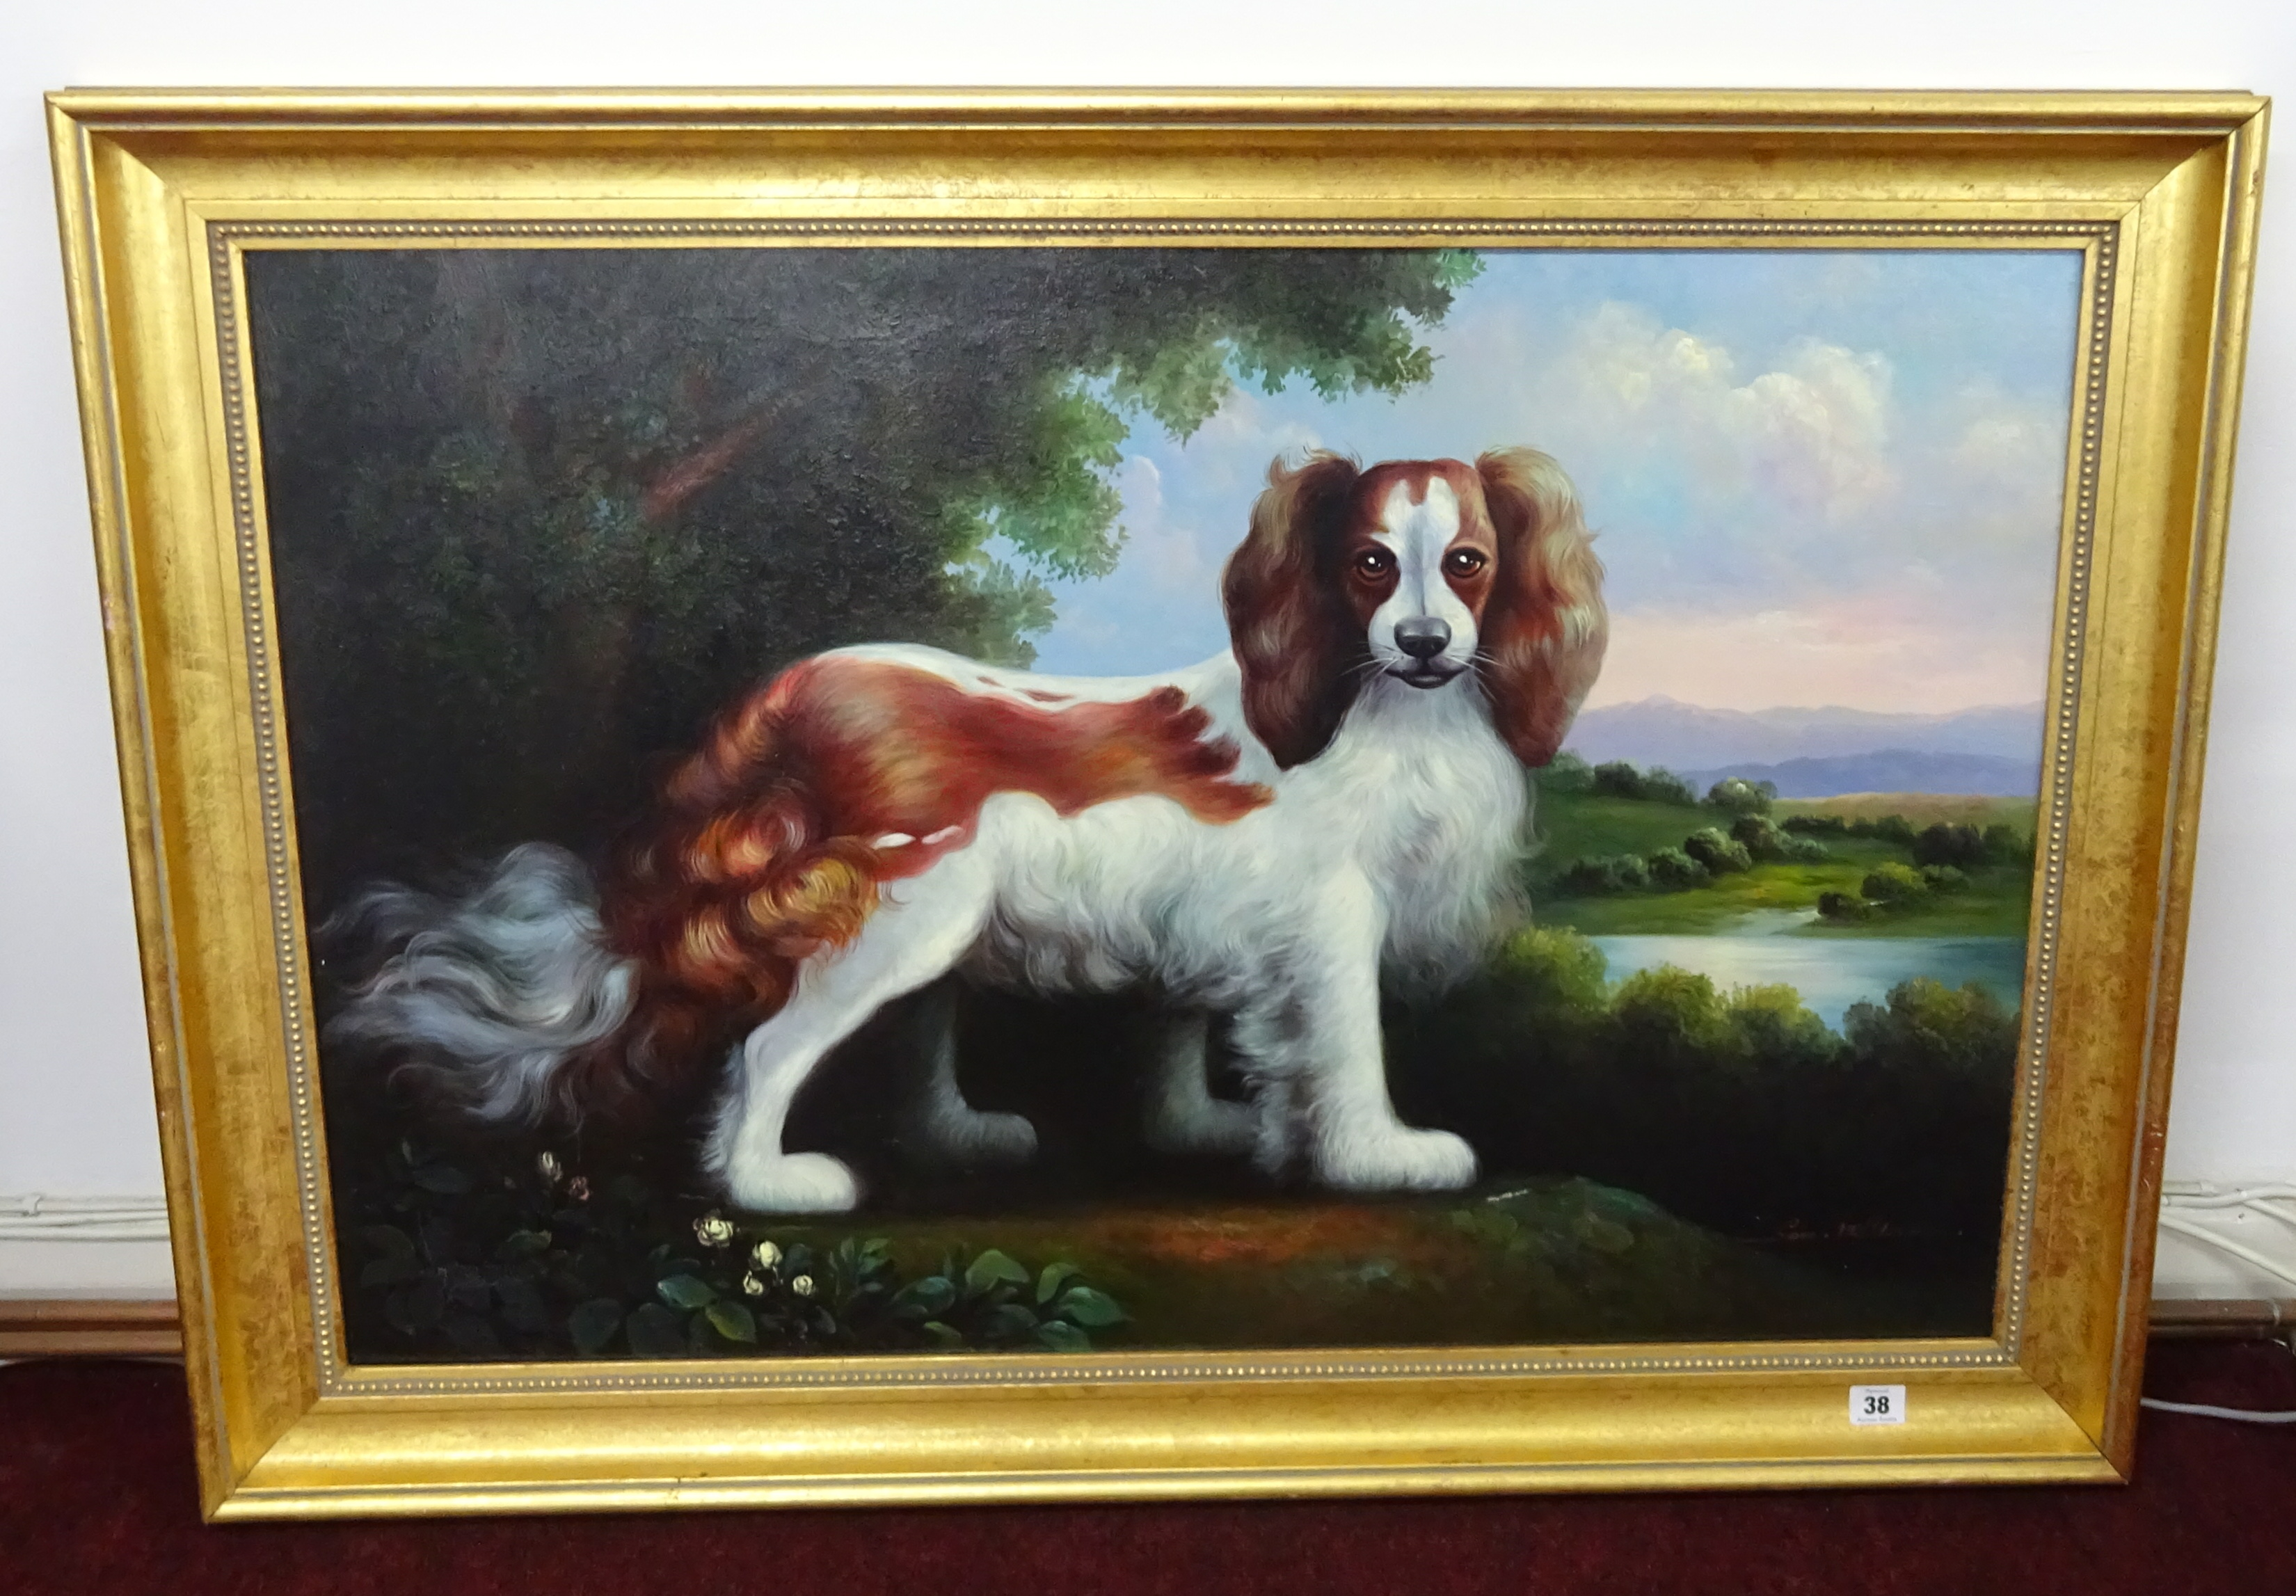 Lot 038 - Sam Miller, 20th century, 'Portrait of a King Charles Spaniel in a landscape', 60cm x 90cm, framed.